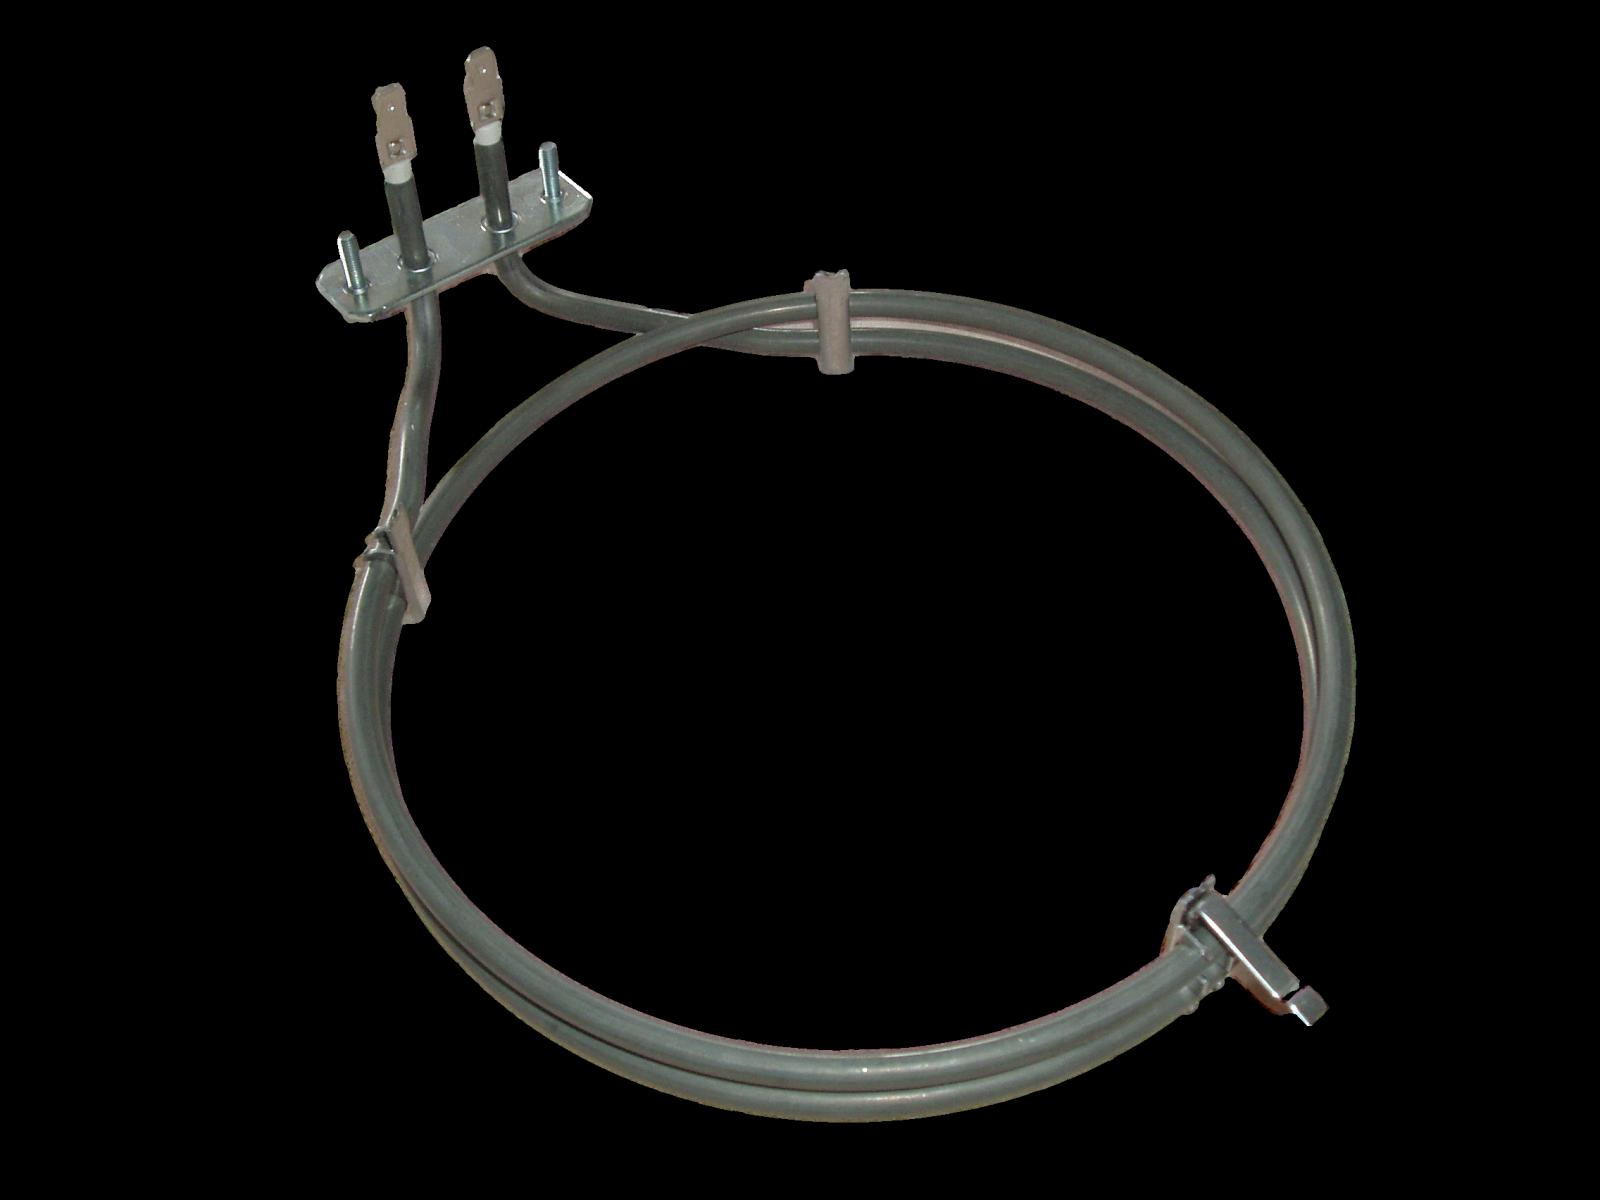 Circular Fan Heater for Mora, Gorenje Ovens - 318349 Gorenje, Mora